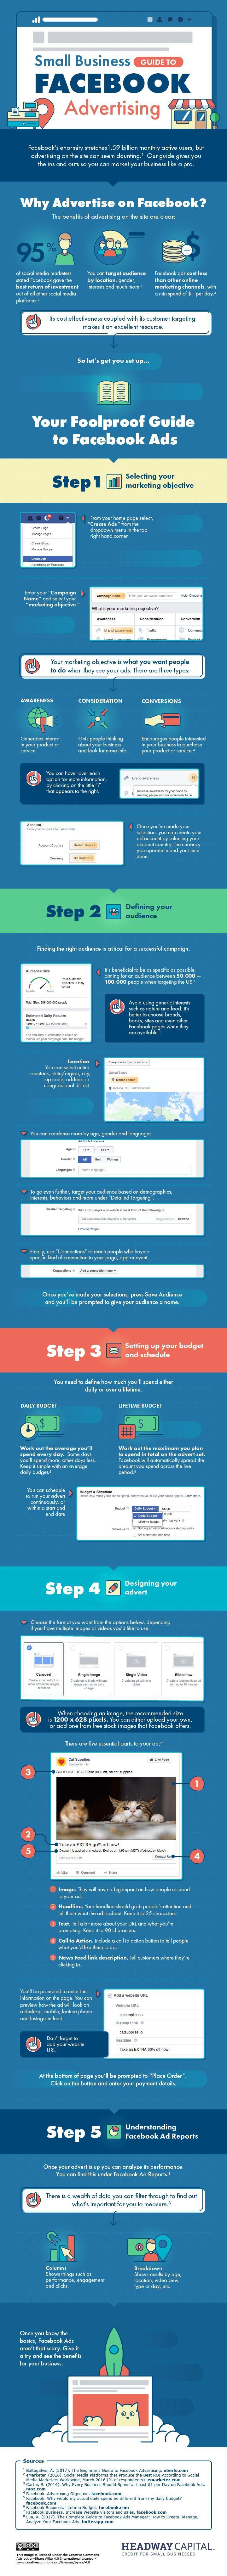 7 best Facebook Advertising images on Pinterest | Advertising ...